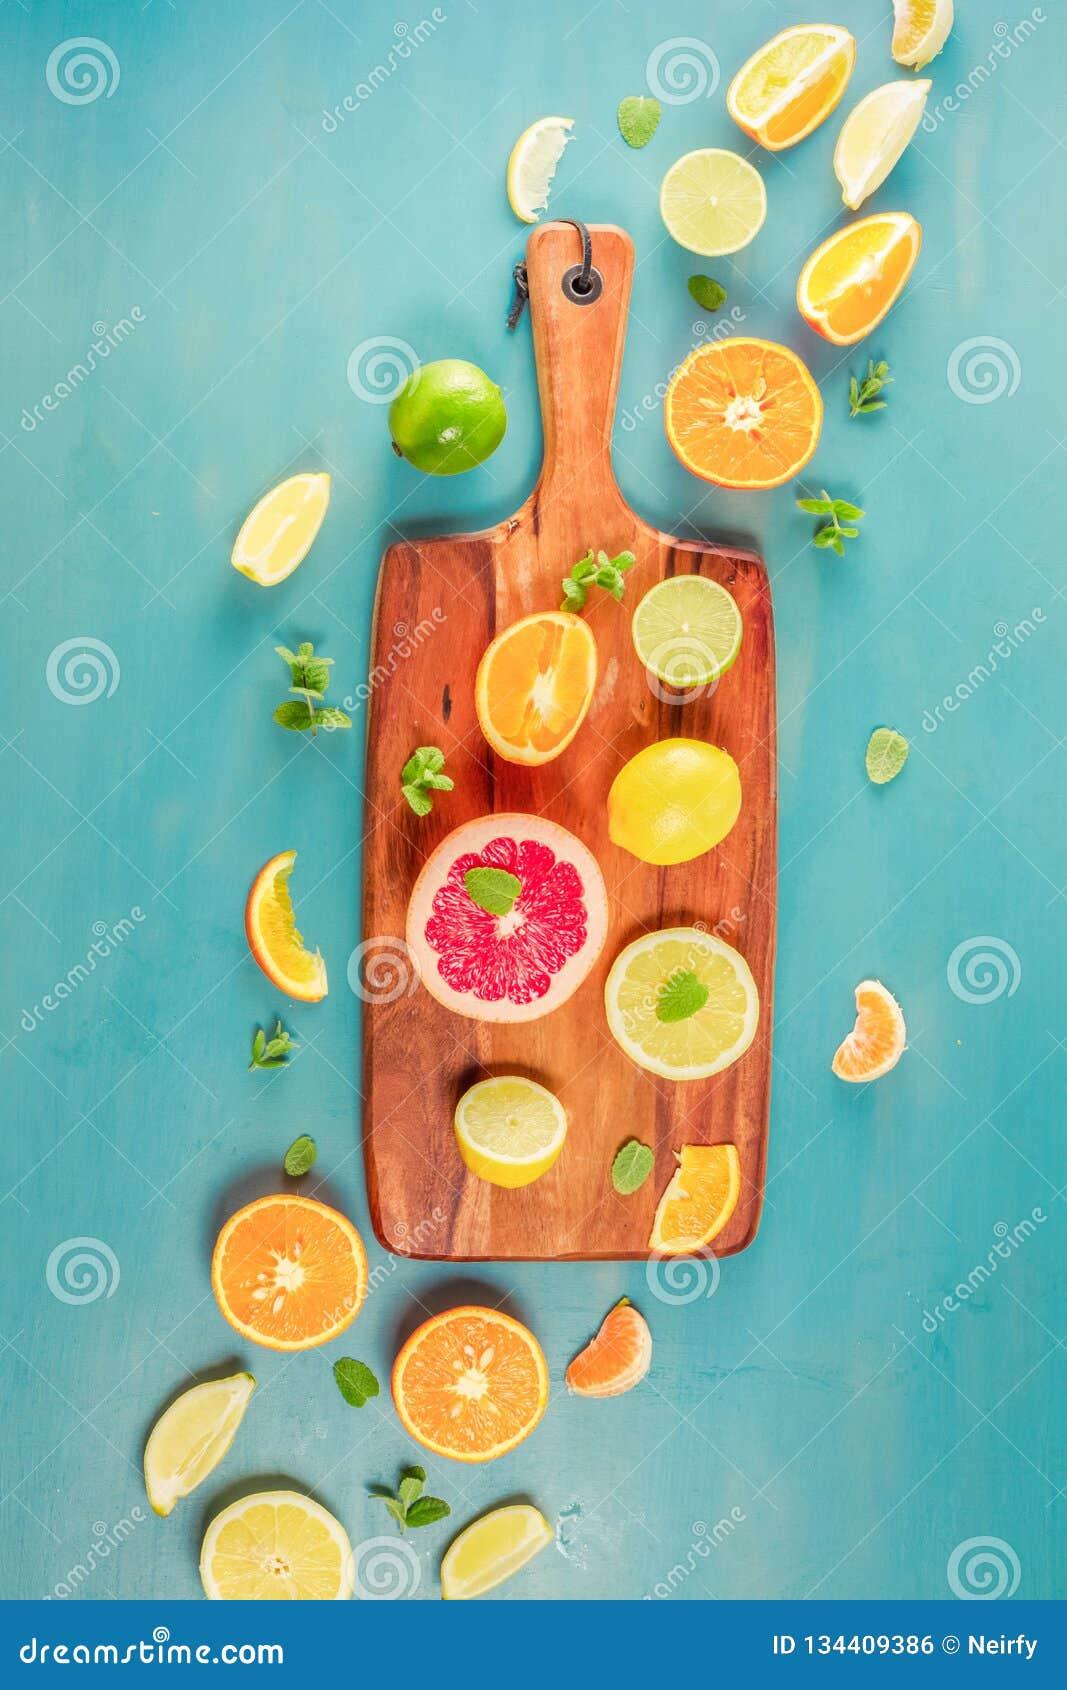 Citrus modell på blått